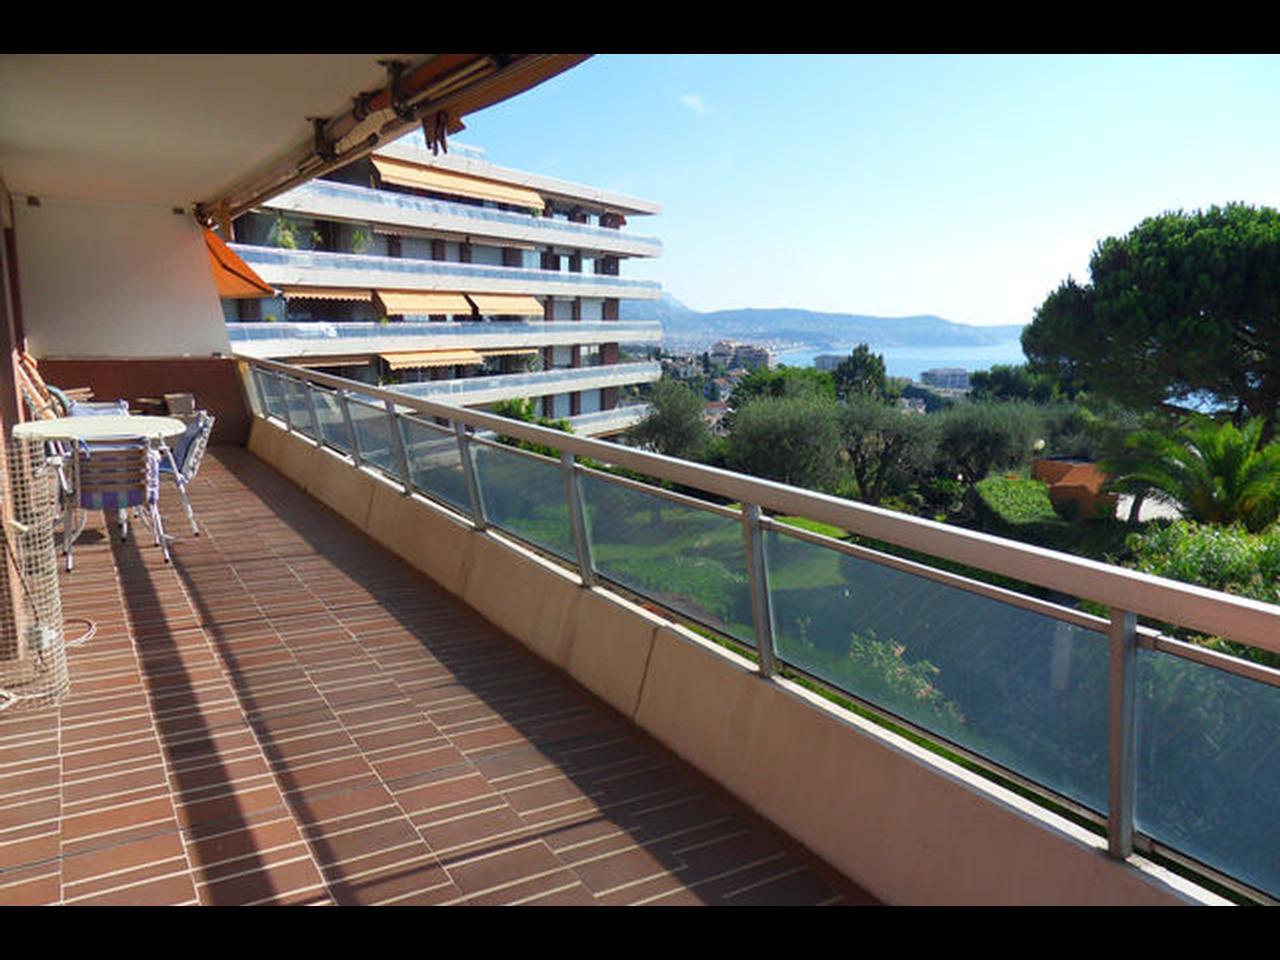 Immobilier nice vue mer appartement nice appartement a vendre vue mer terrasse piscine nice ouest - Piscine pente terrain nice ...